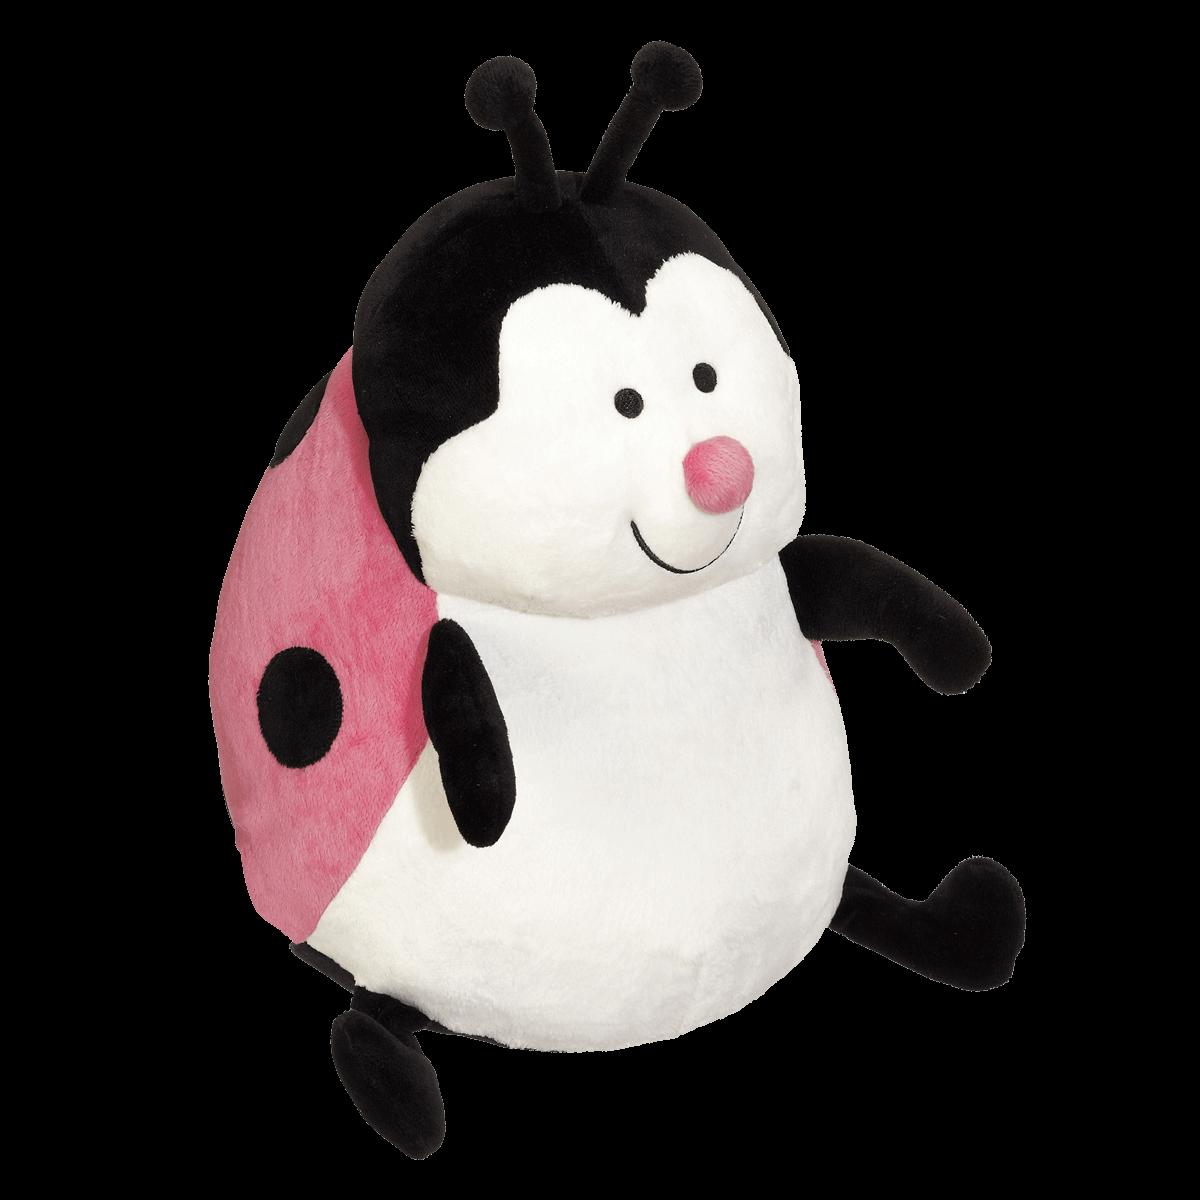 Landy Ladybug-Pink